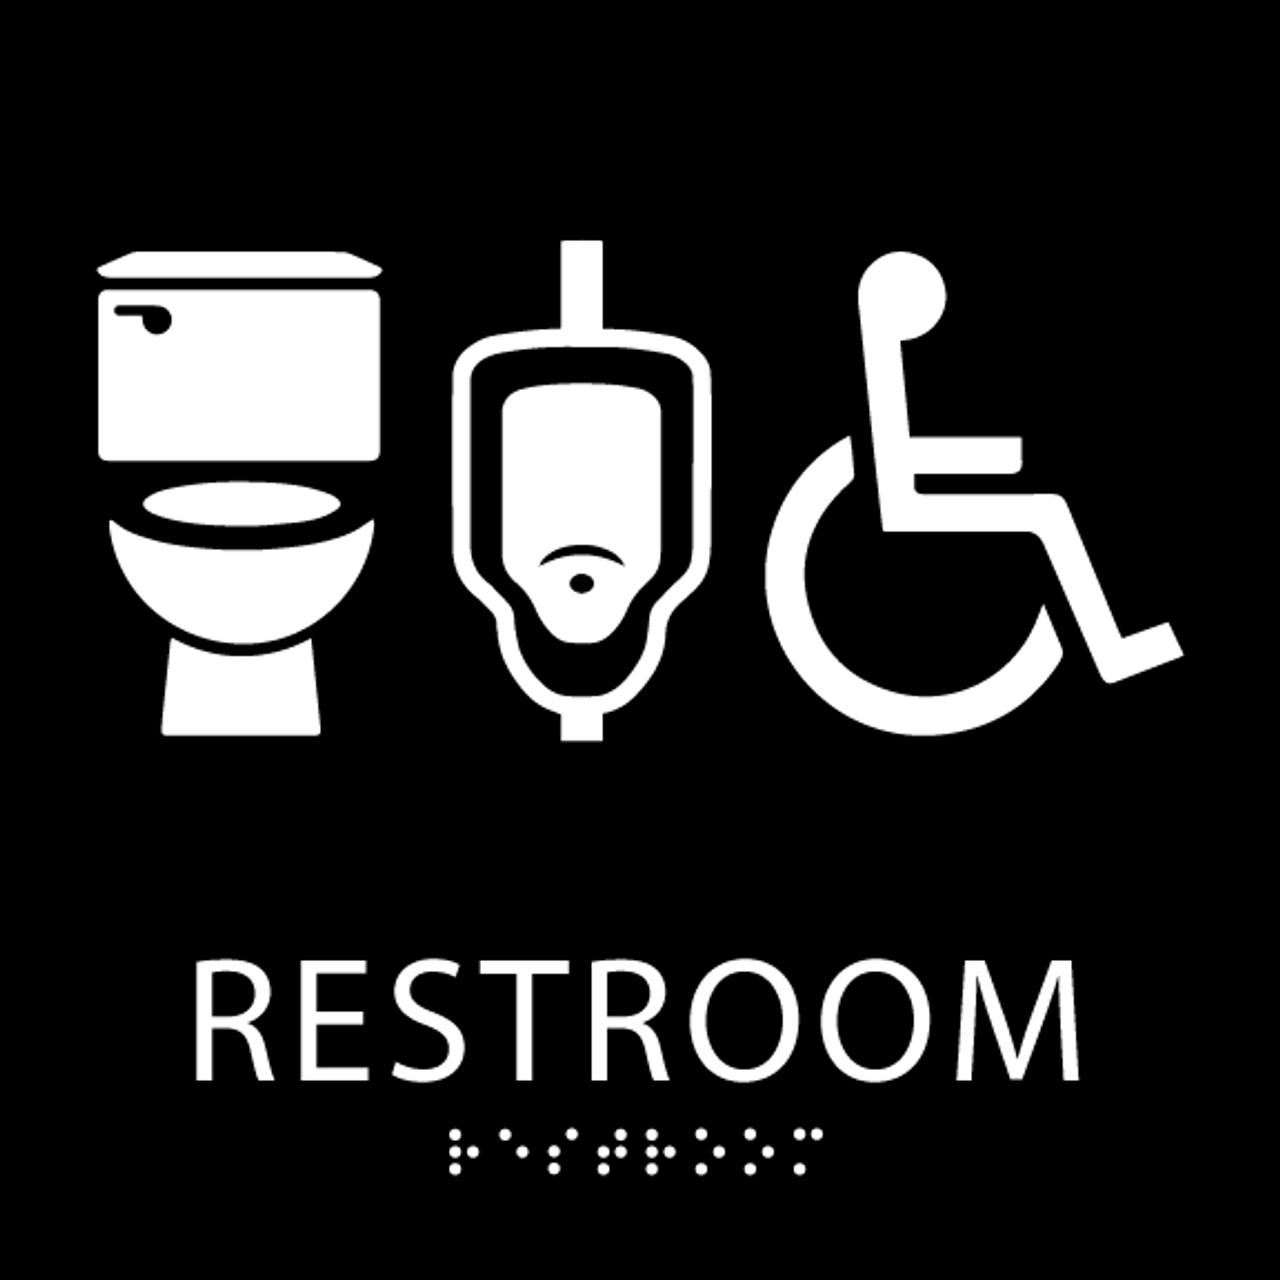 Black plastic restroom wall sign